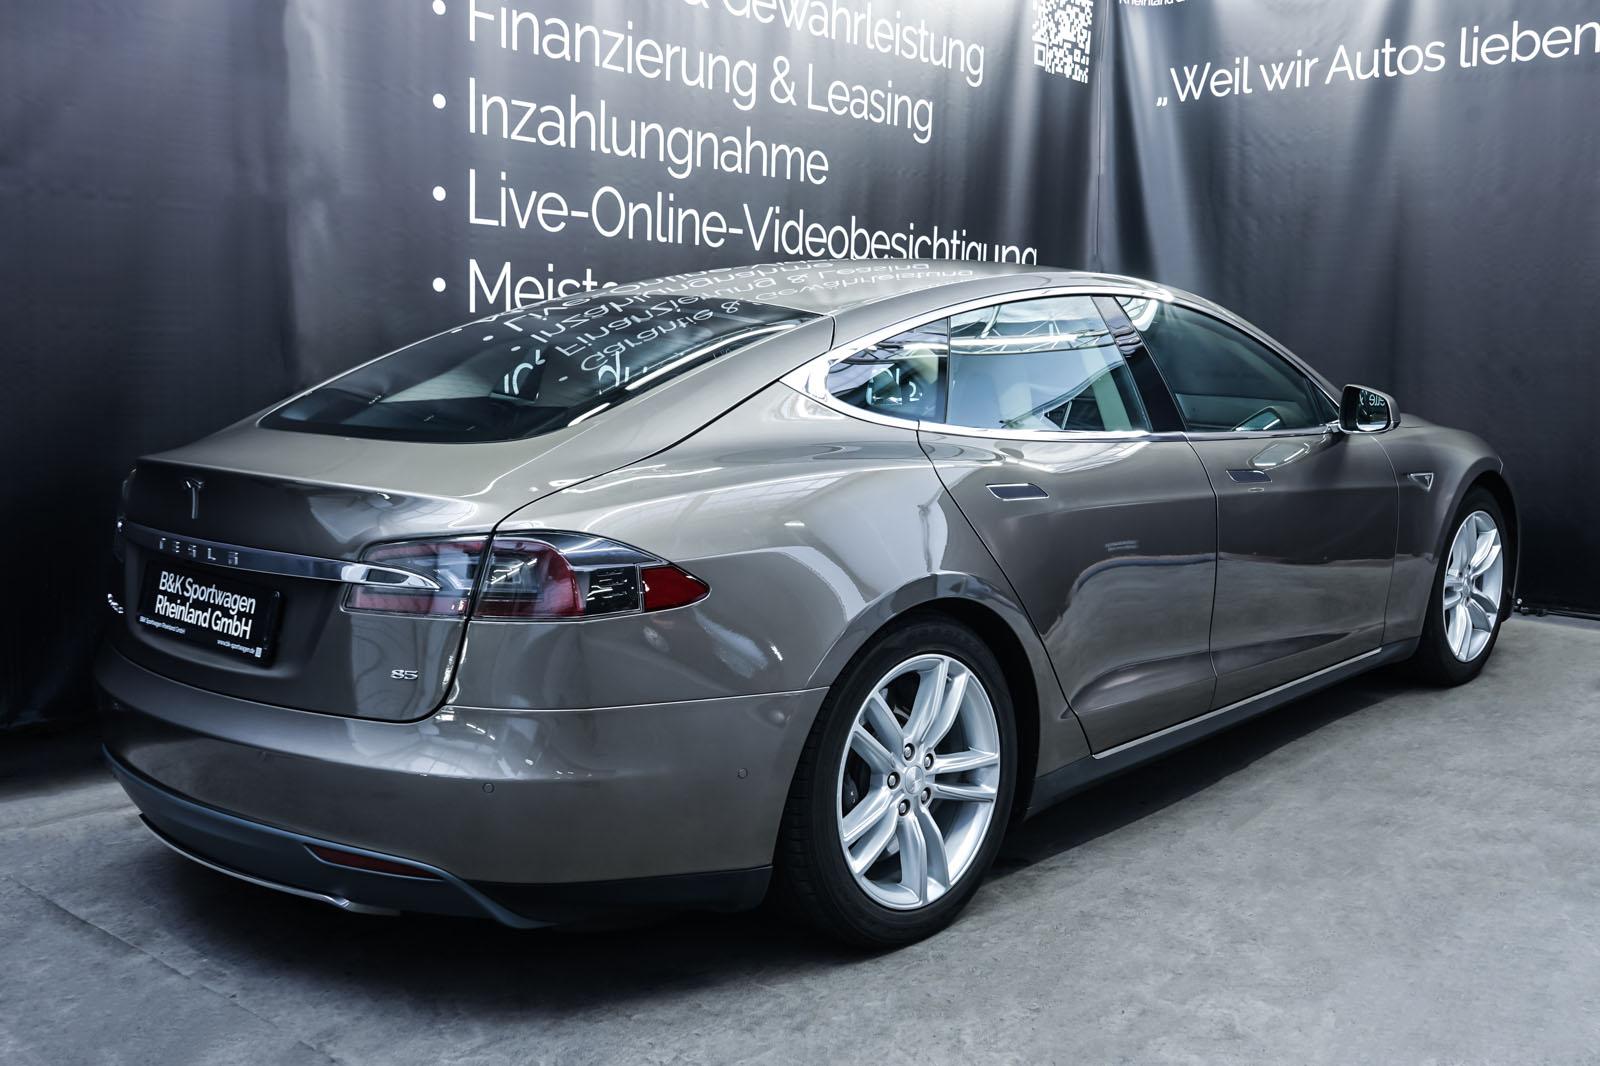 Tesla_ModelS85D_TitaniumMetallic_Beige_Tes-2897_14_w